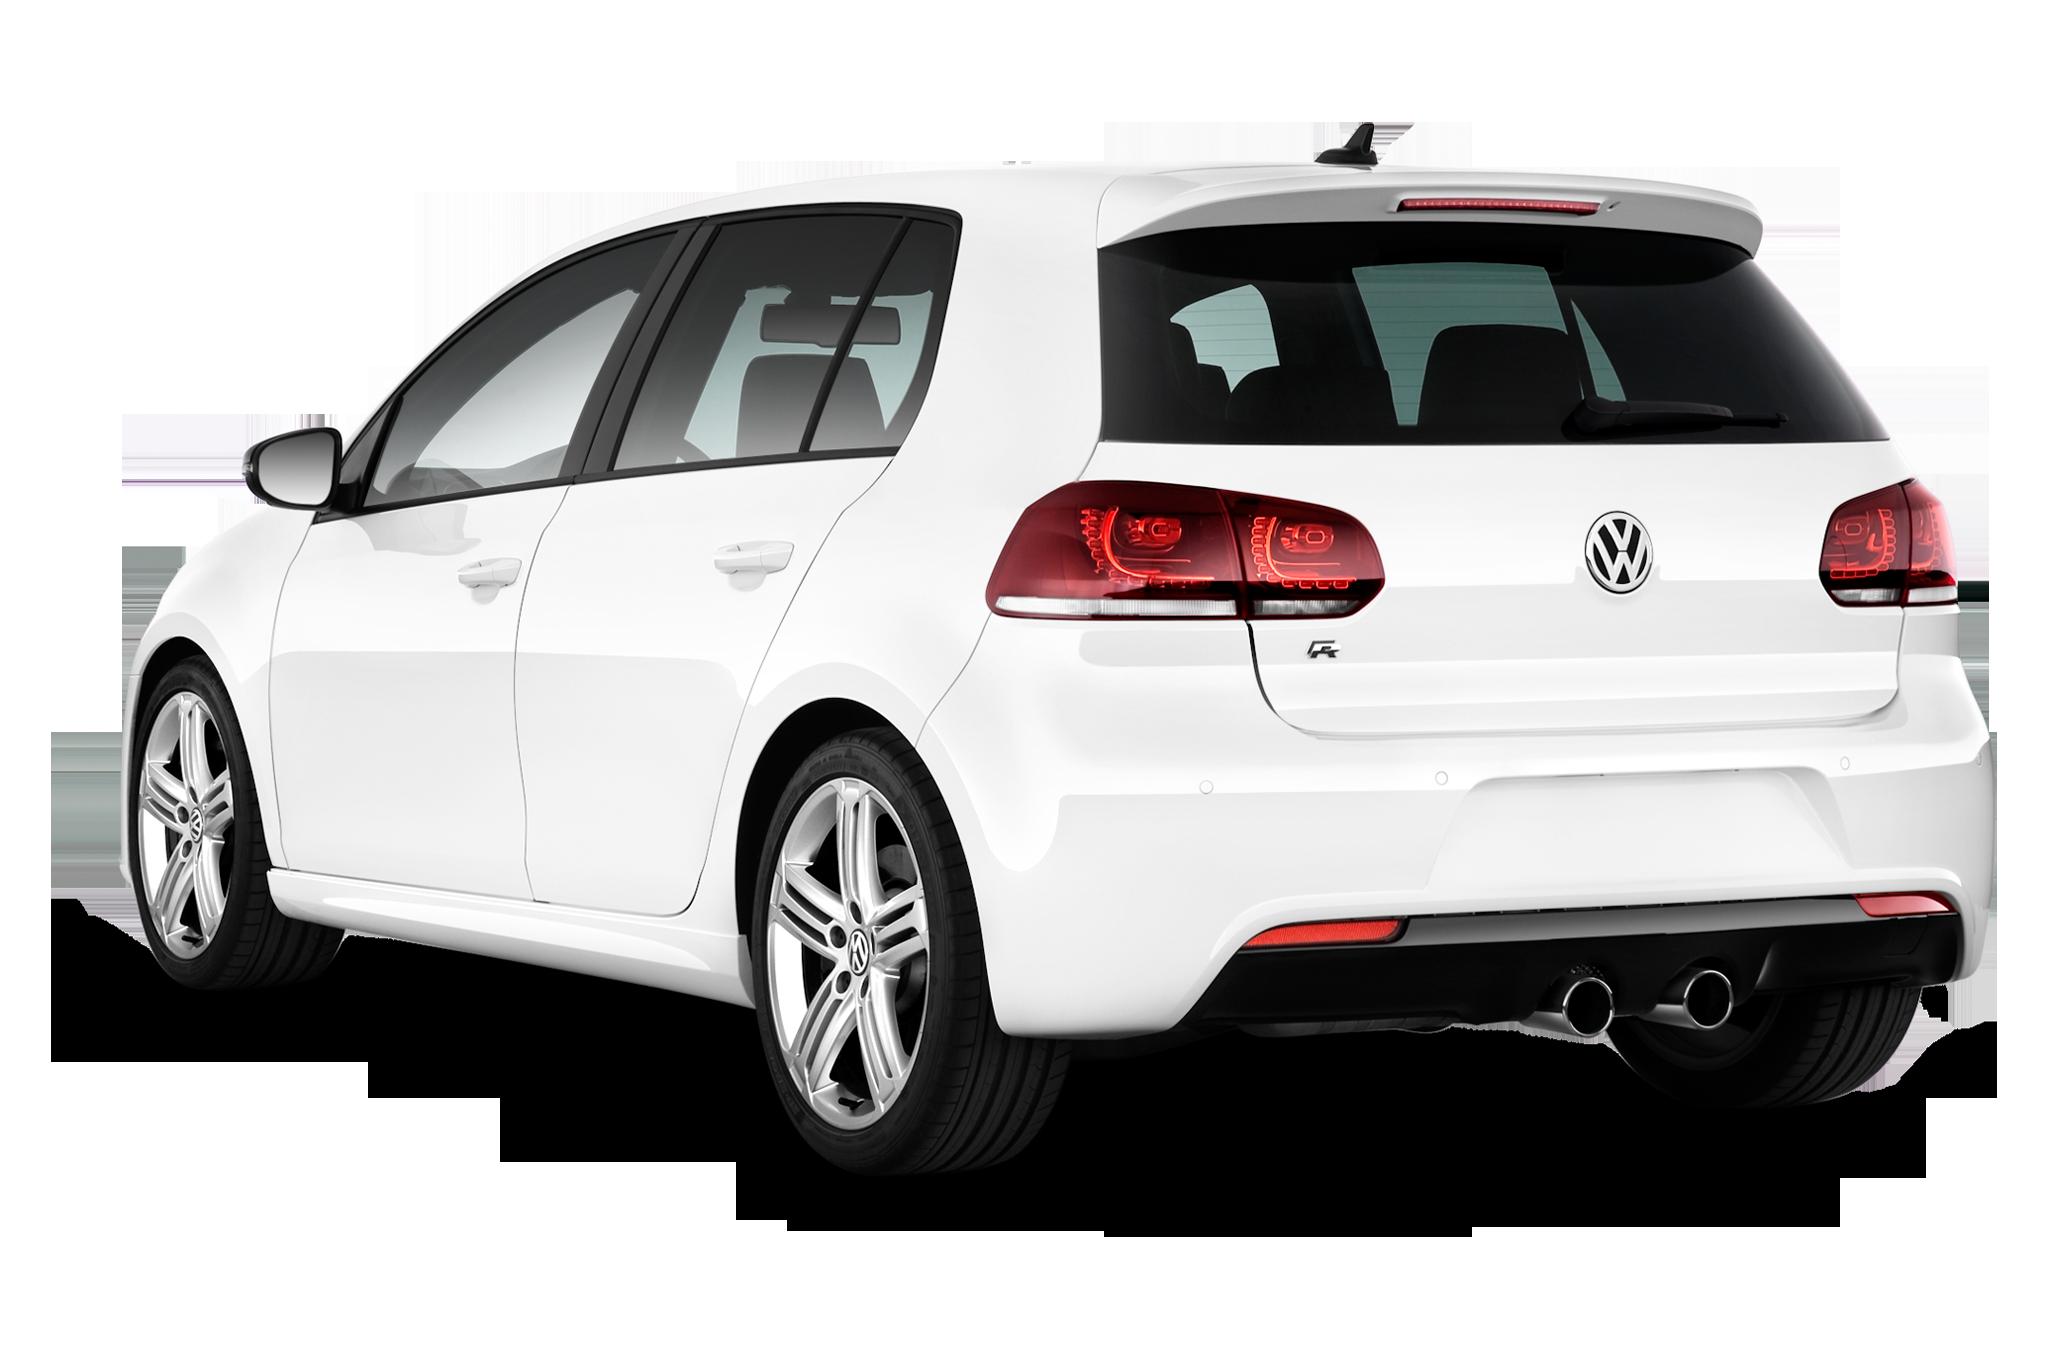 Volkswagen Golf R VI 2009 - 2012 Cabriolet #4